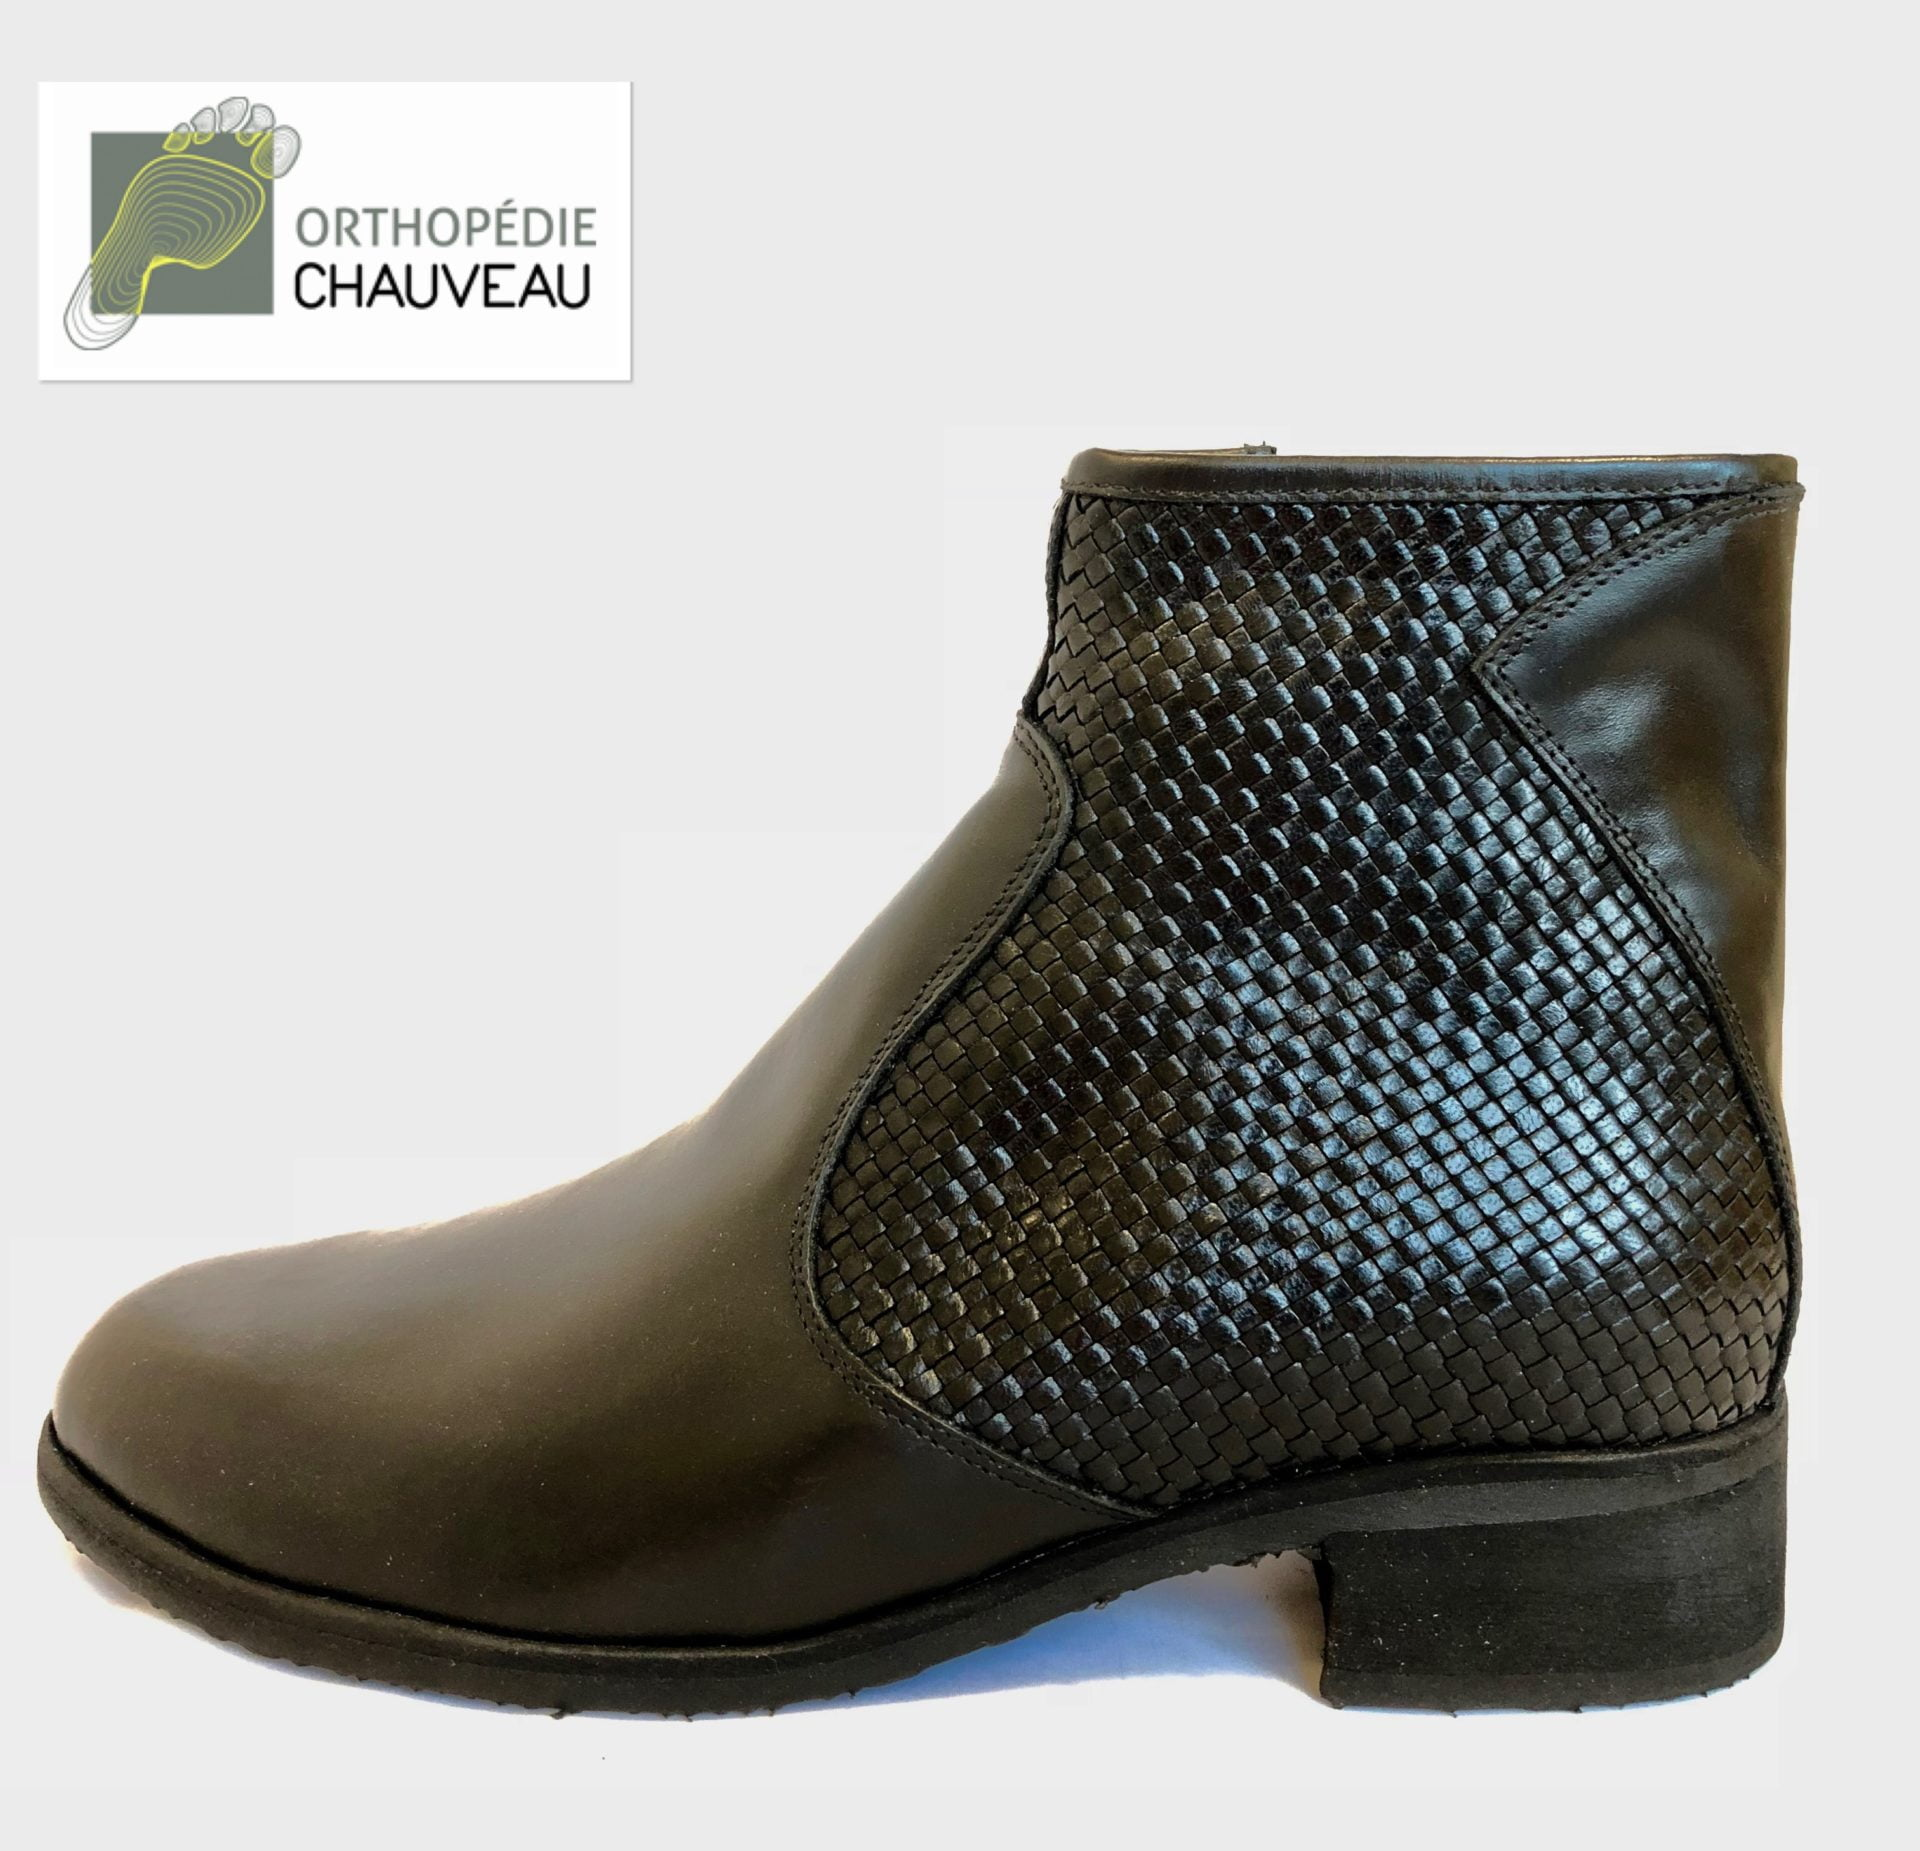 chaussures orthopediques Rennes cuir noir